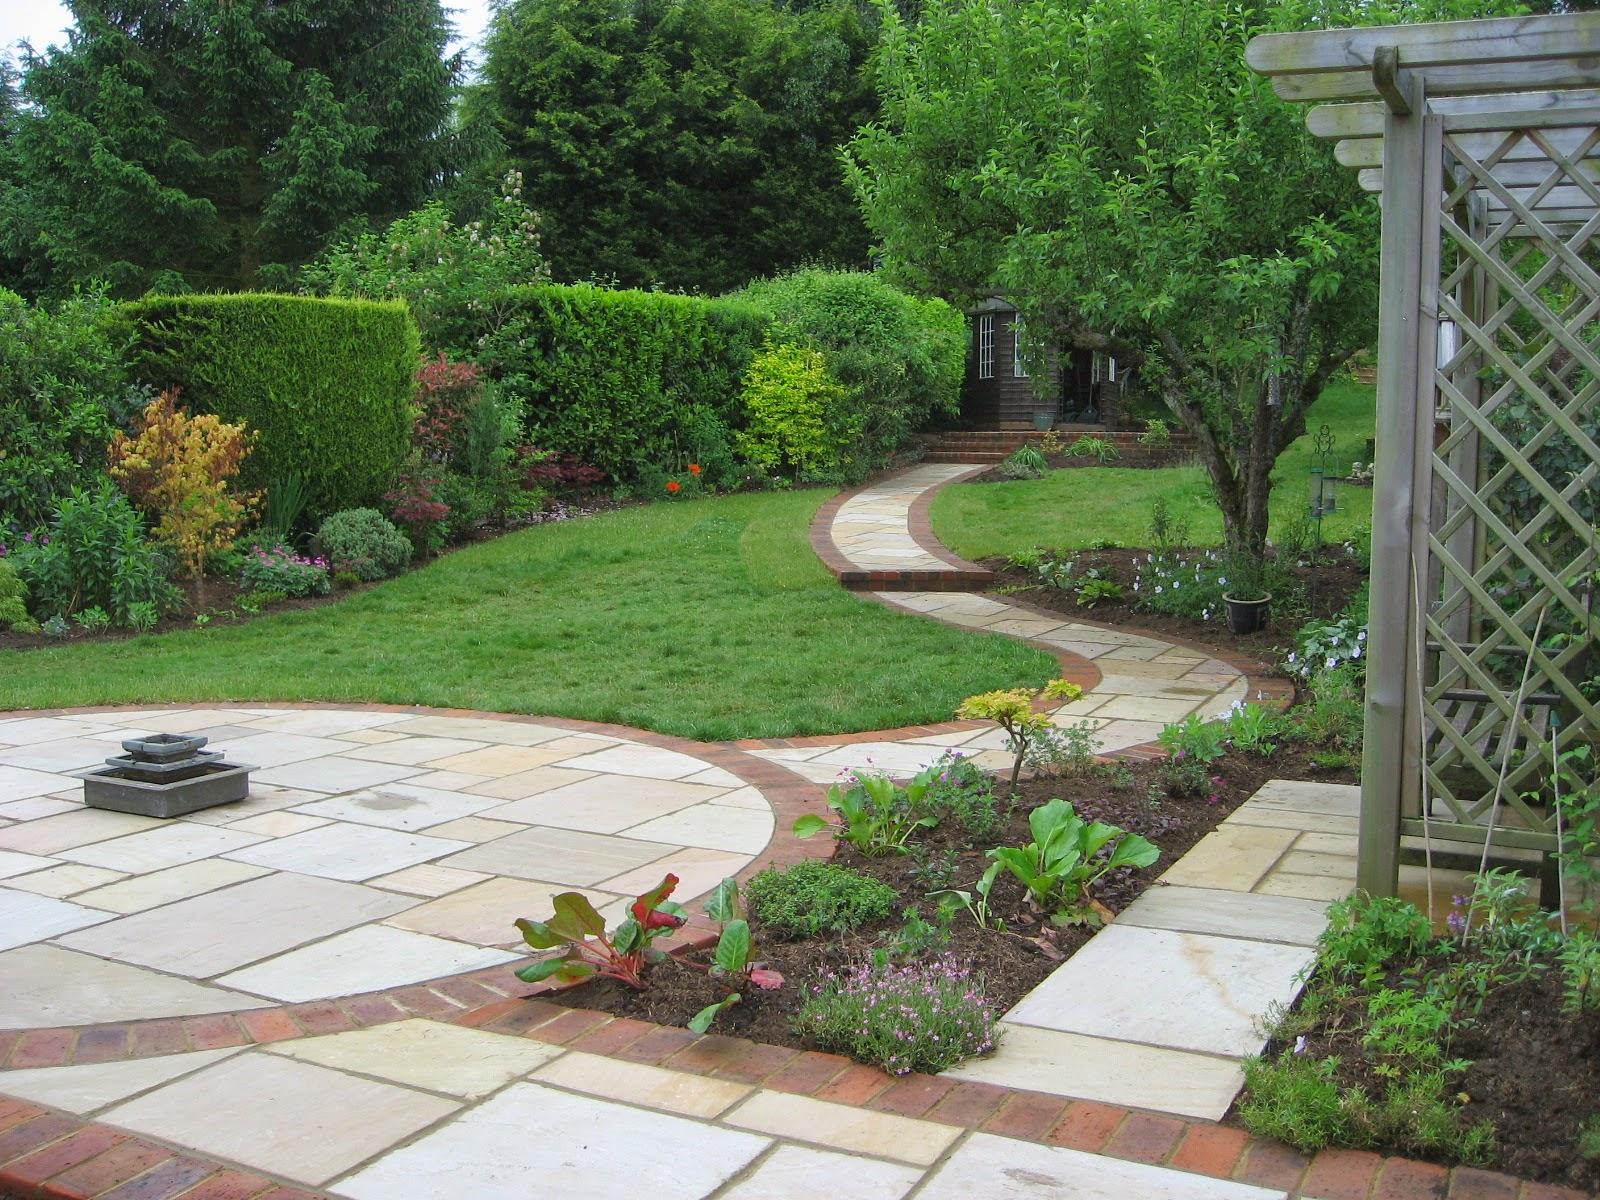 16 pictures sloping garden ideas lentine marine 65196 for Sloping garden designs